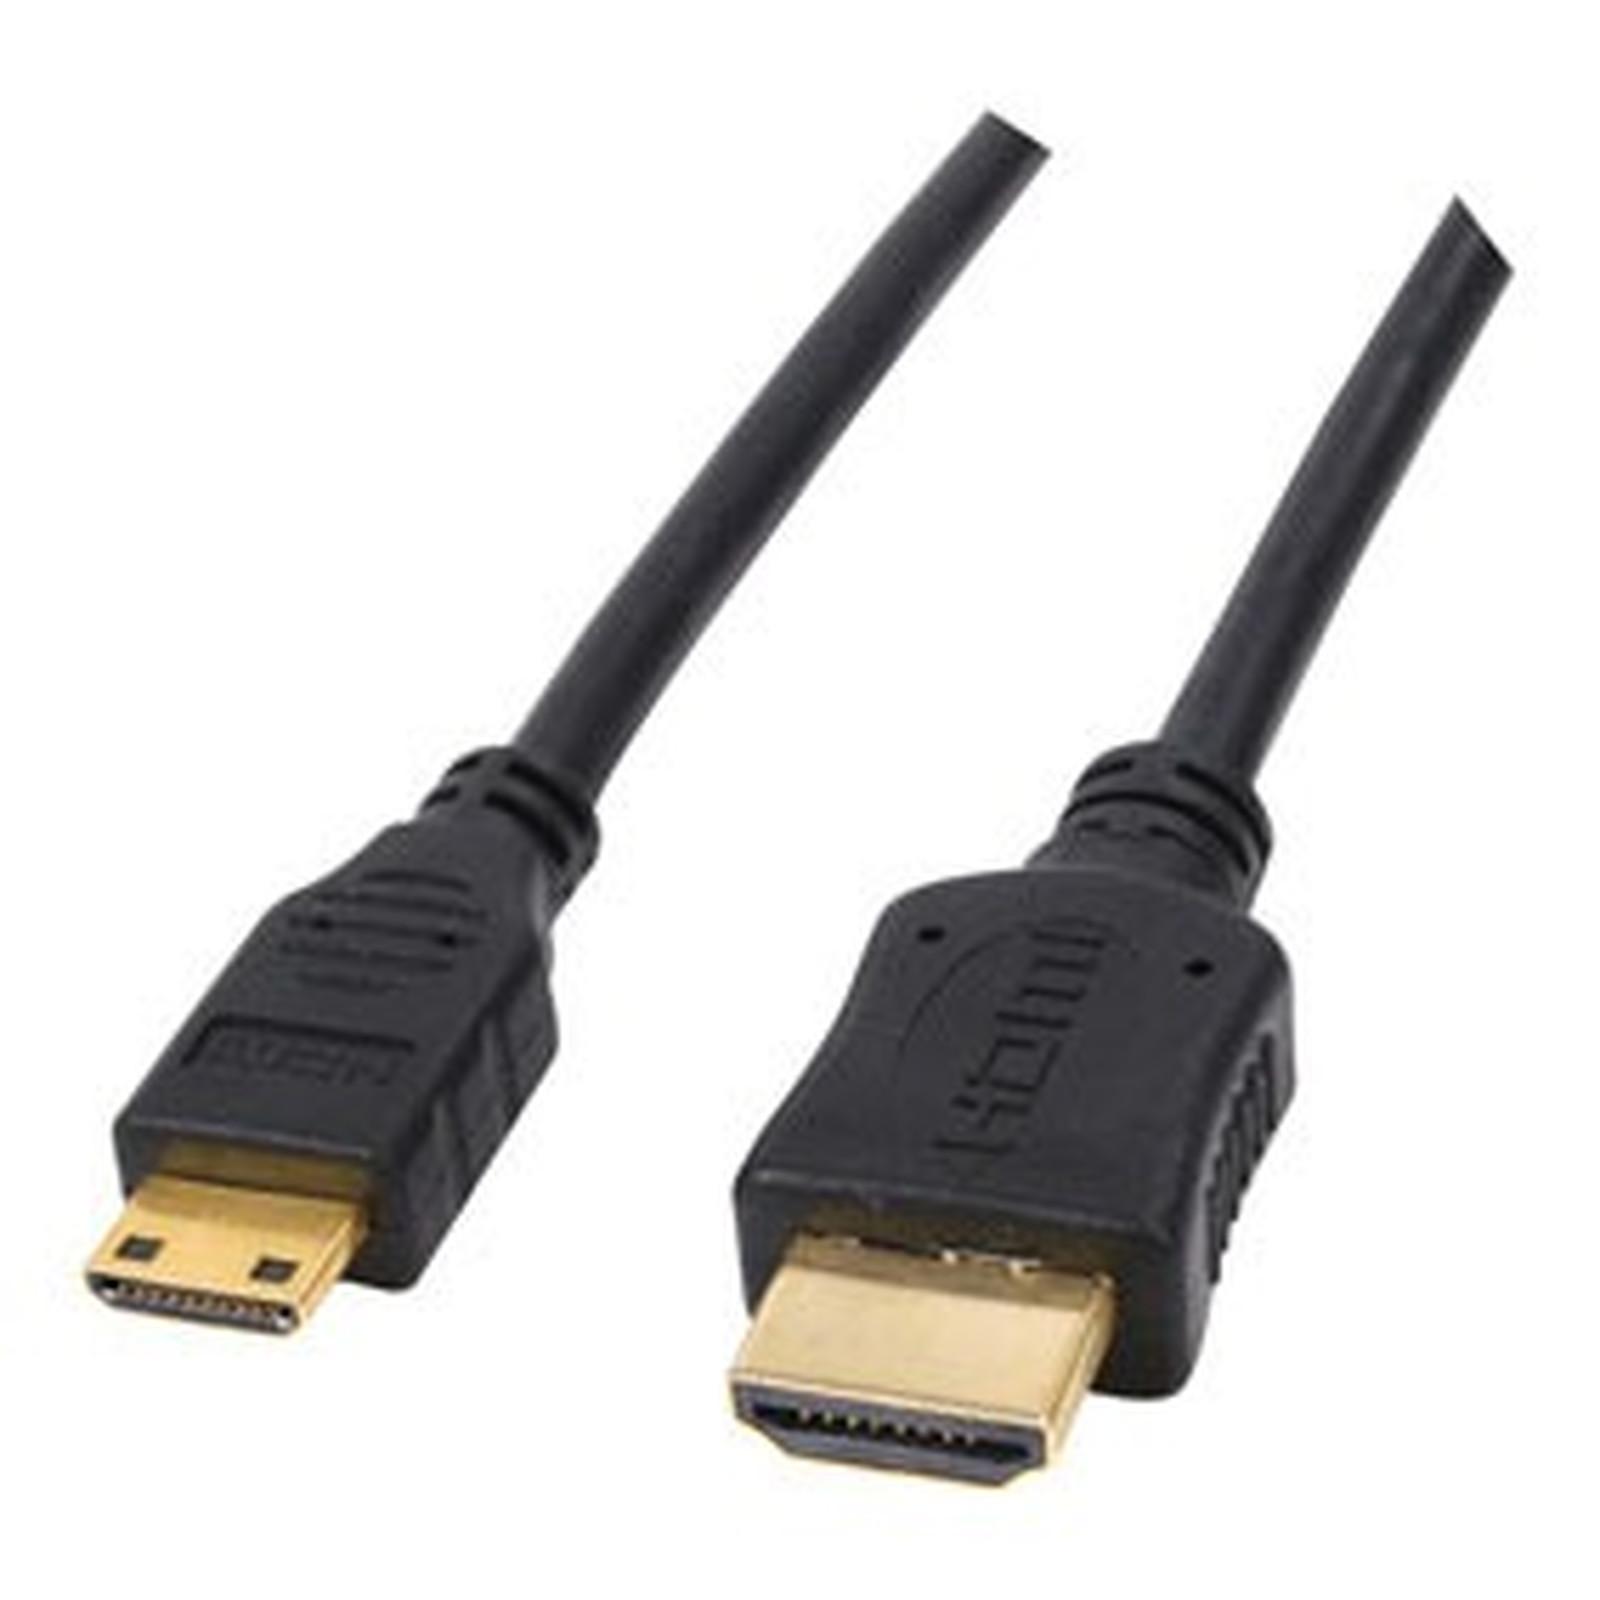 Câble HDMI mâle / mini HDMI mâle (plaqué or) - (5 mètres)